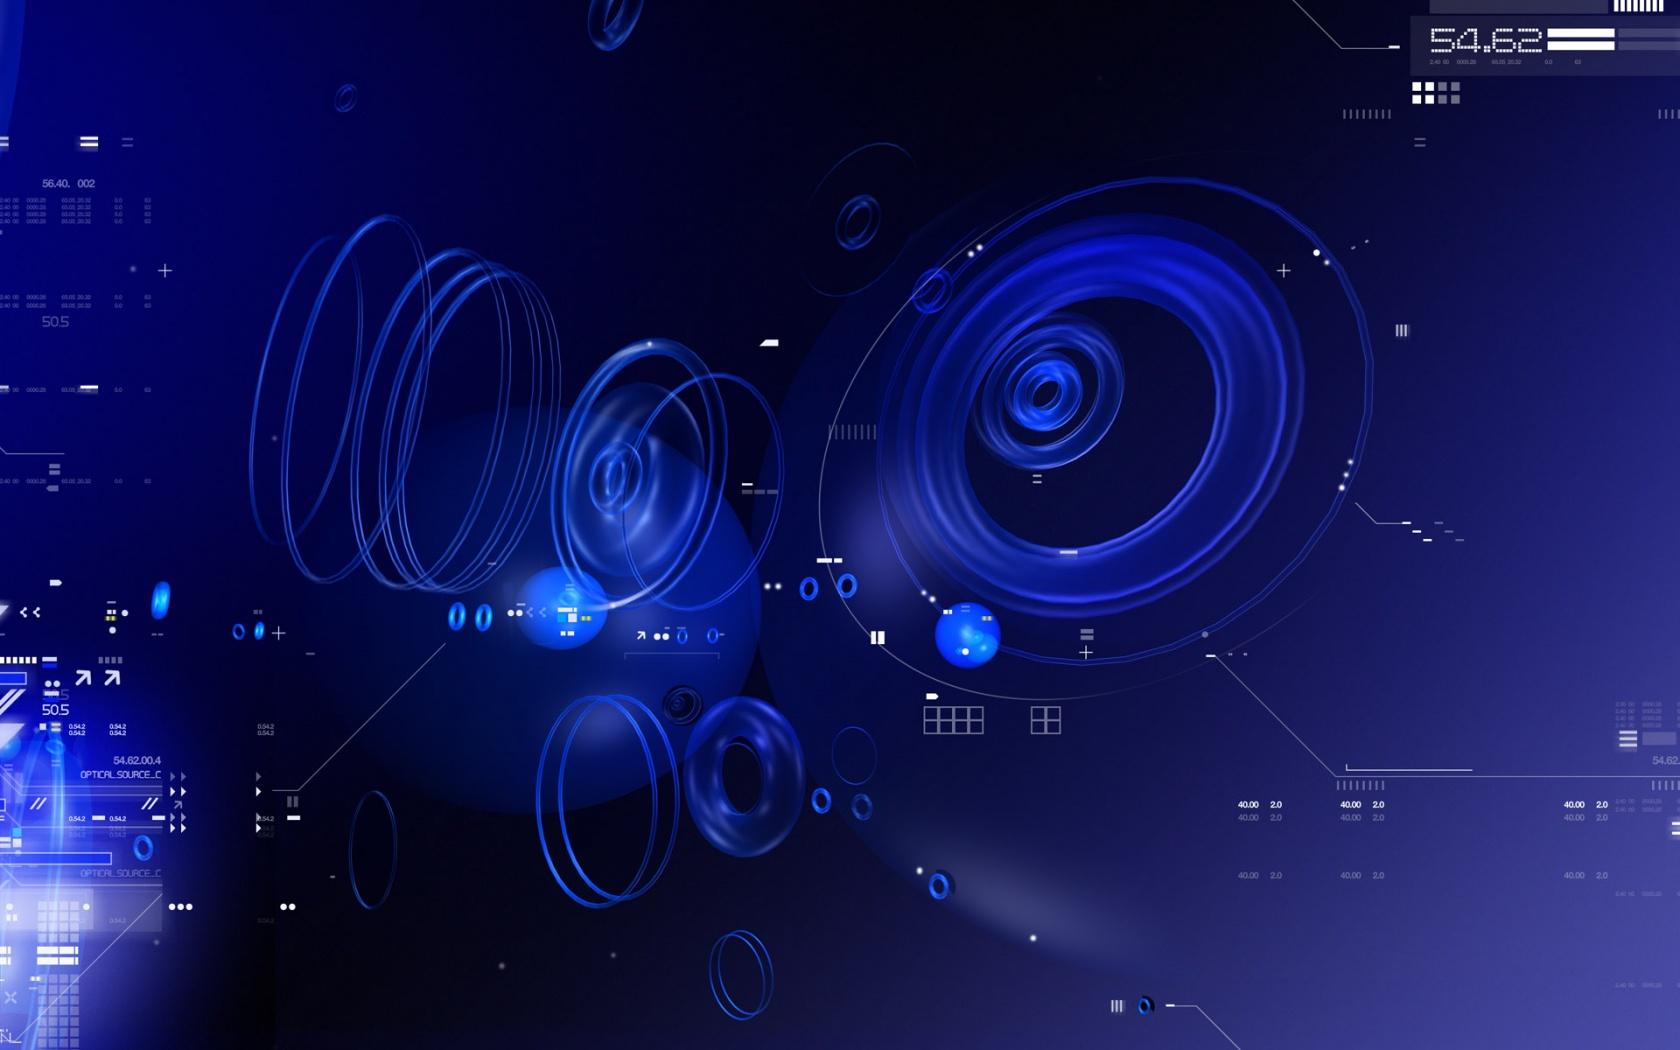 Blue Tech Circles Wallpapers HD Wallpapers 1680x1050